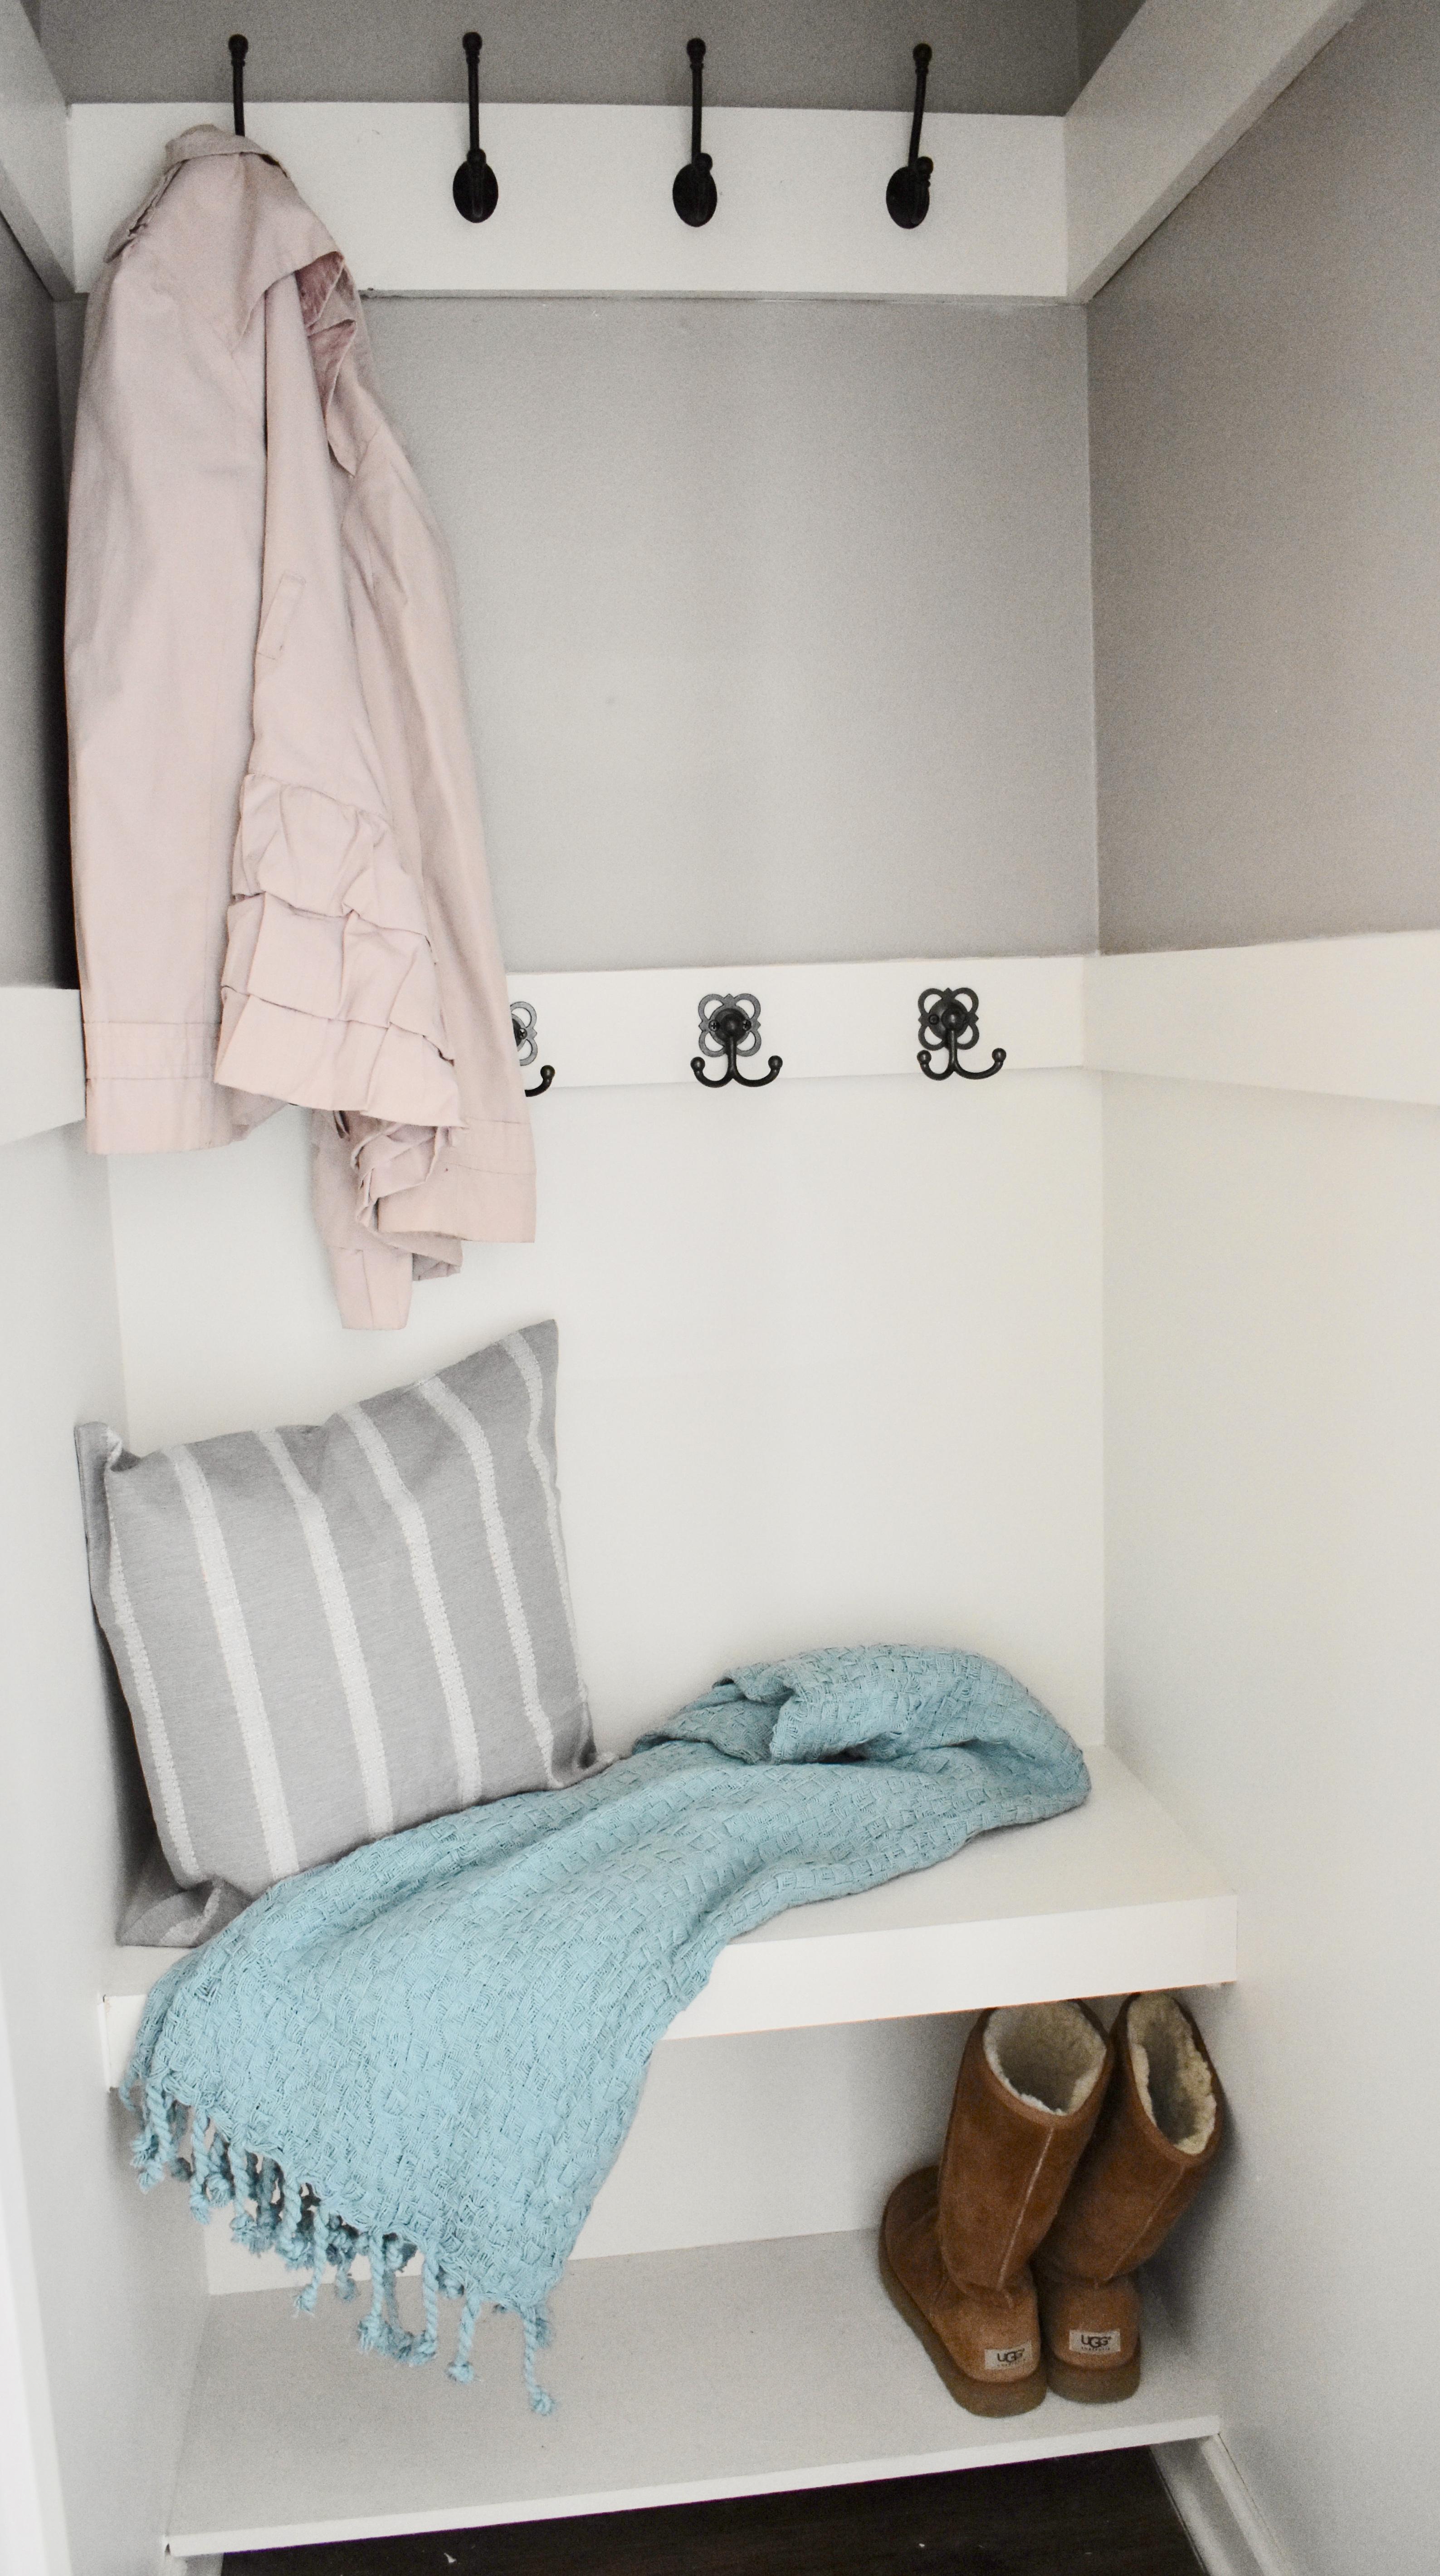 Coat Closet, Coat Closet, coat closet renovation, under $50, refresh, storage solutions, coat closet storage, closet makeover, diy shelving, lowes, hooks, coat handger, diy floating shelf